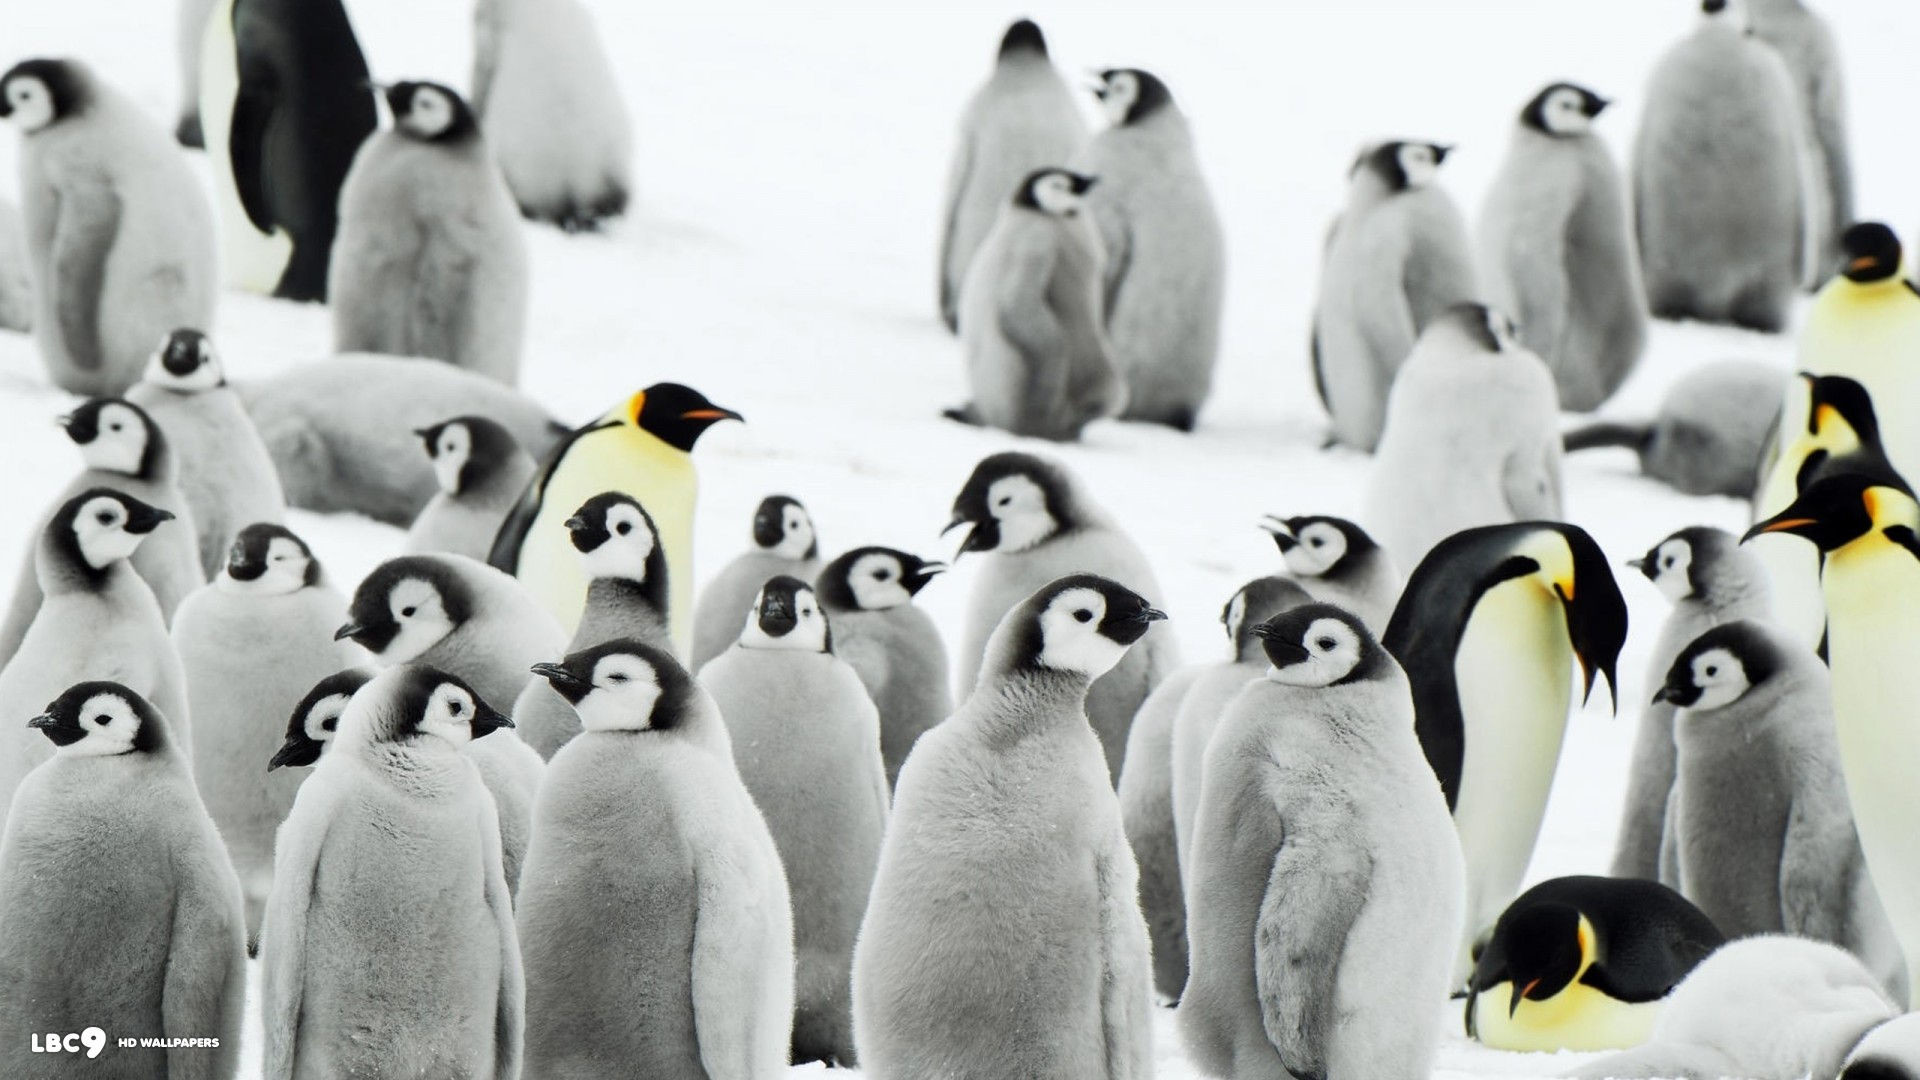 penguins wallpaper 1080p